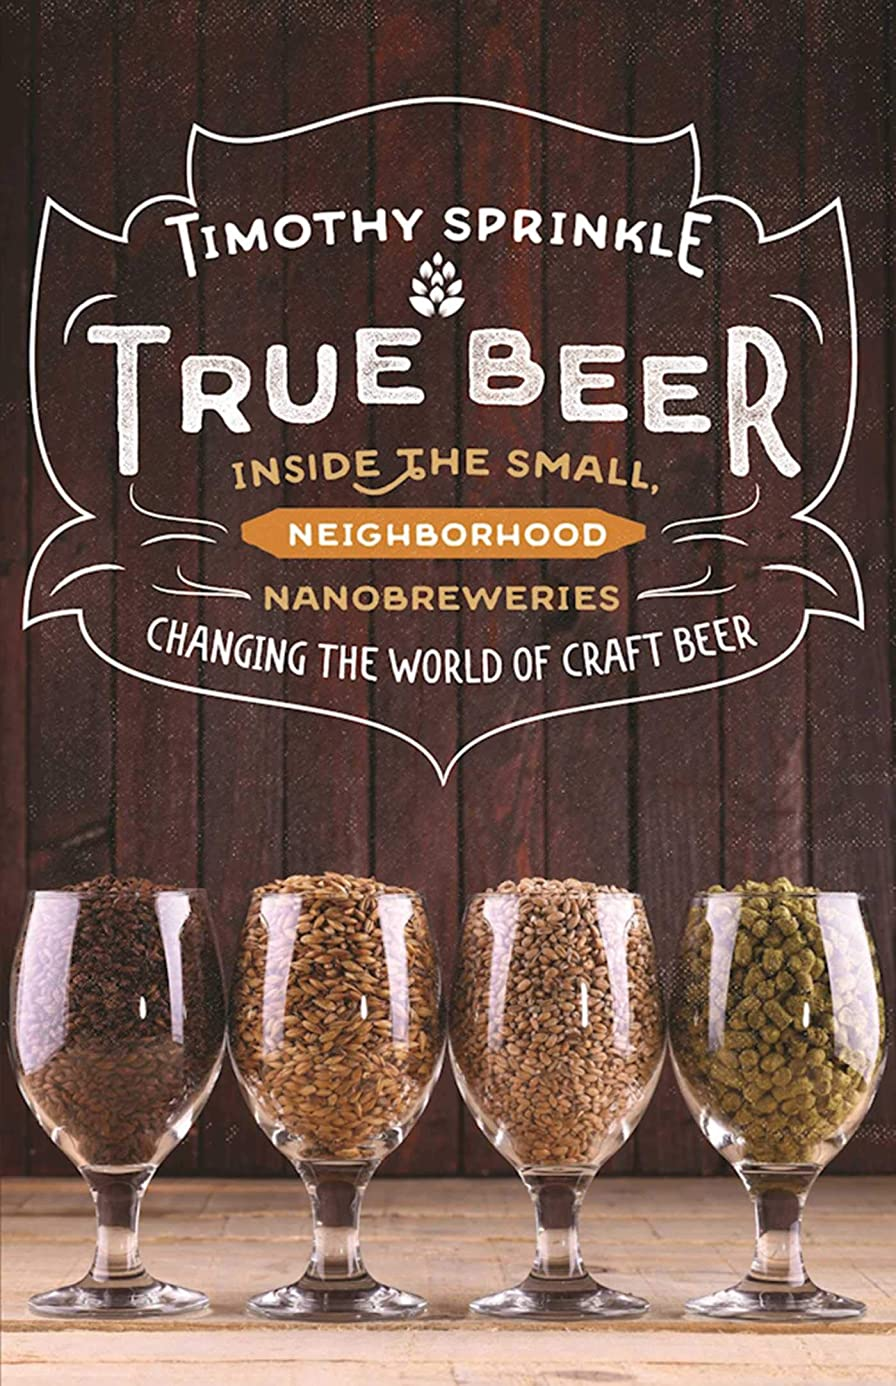 True Beer: Inside the Small, Neighborhood Nanobreweries Changing the World of Craft Beer